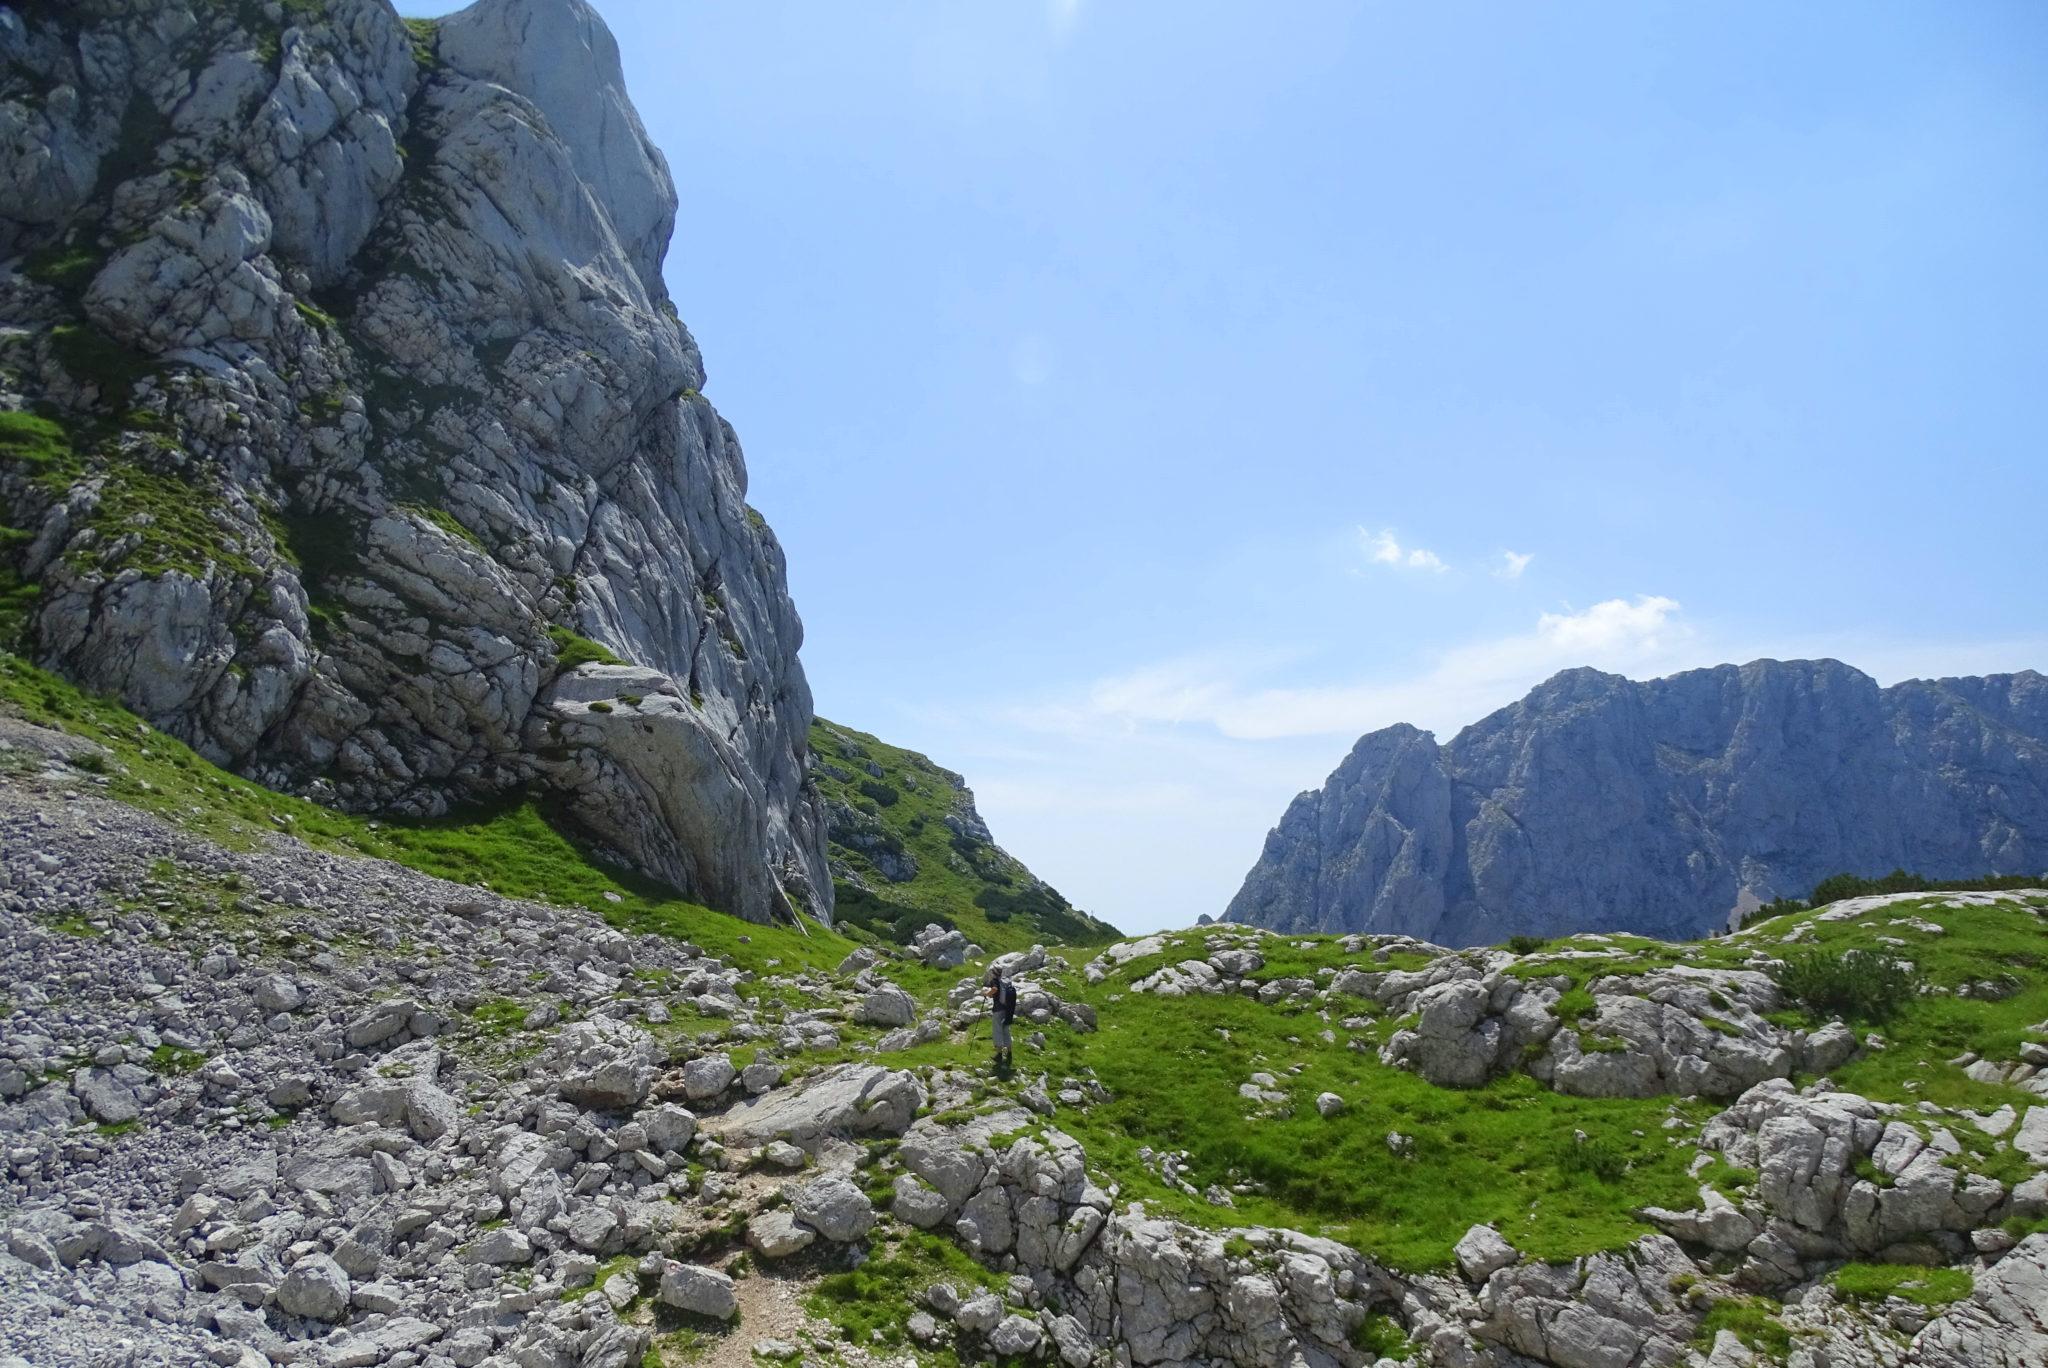 Returning back from Grintovec, Kamnik-Savinja Alps